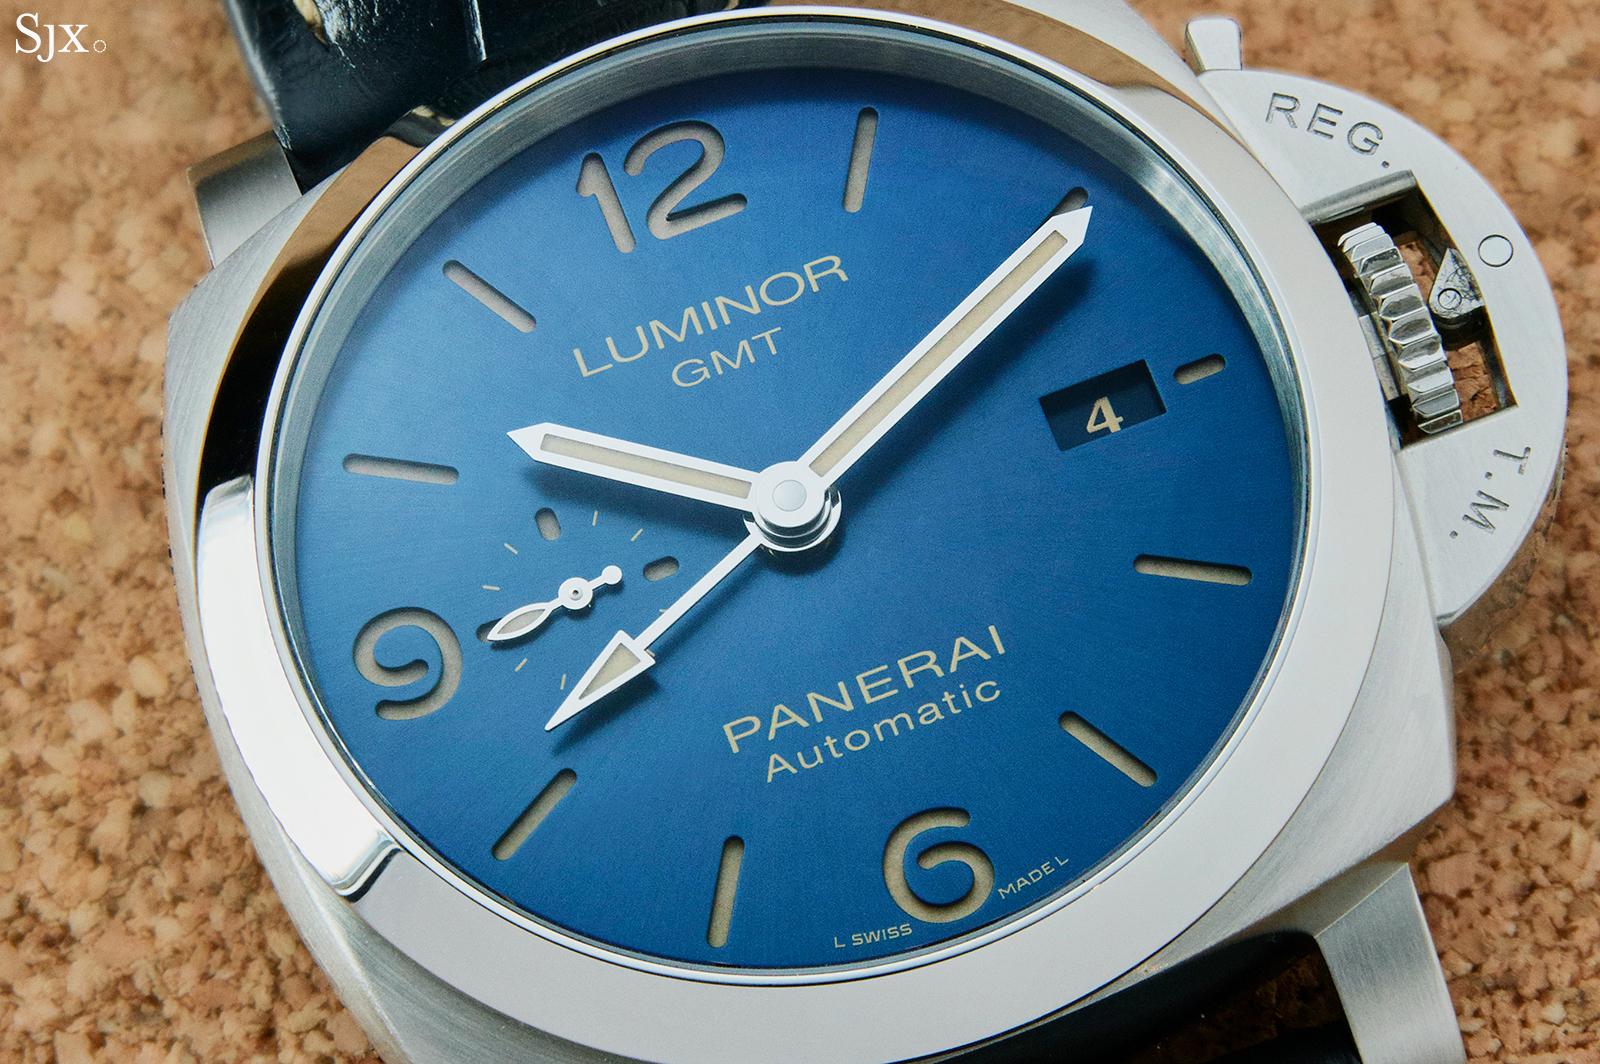 Panerai Luminor GMT PAM1033 dial 3